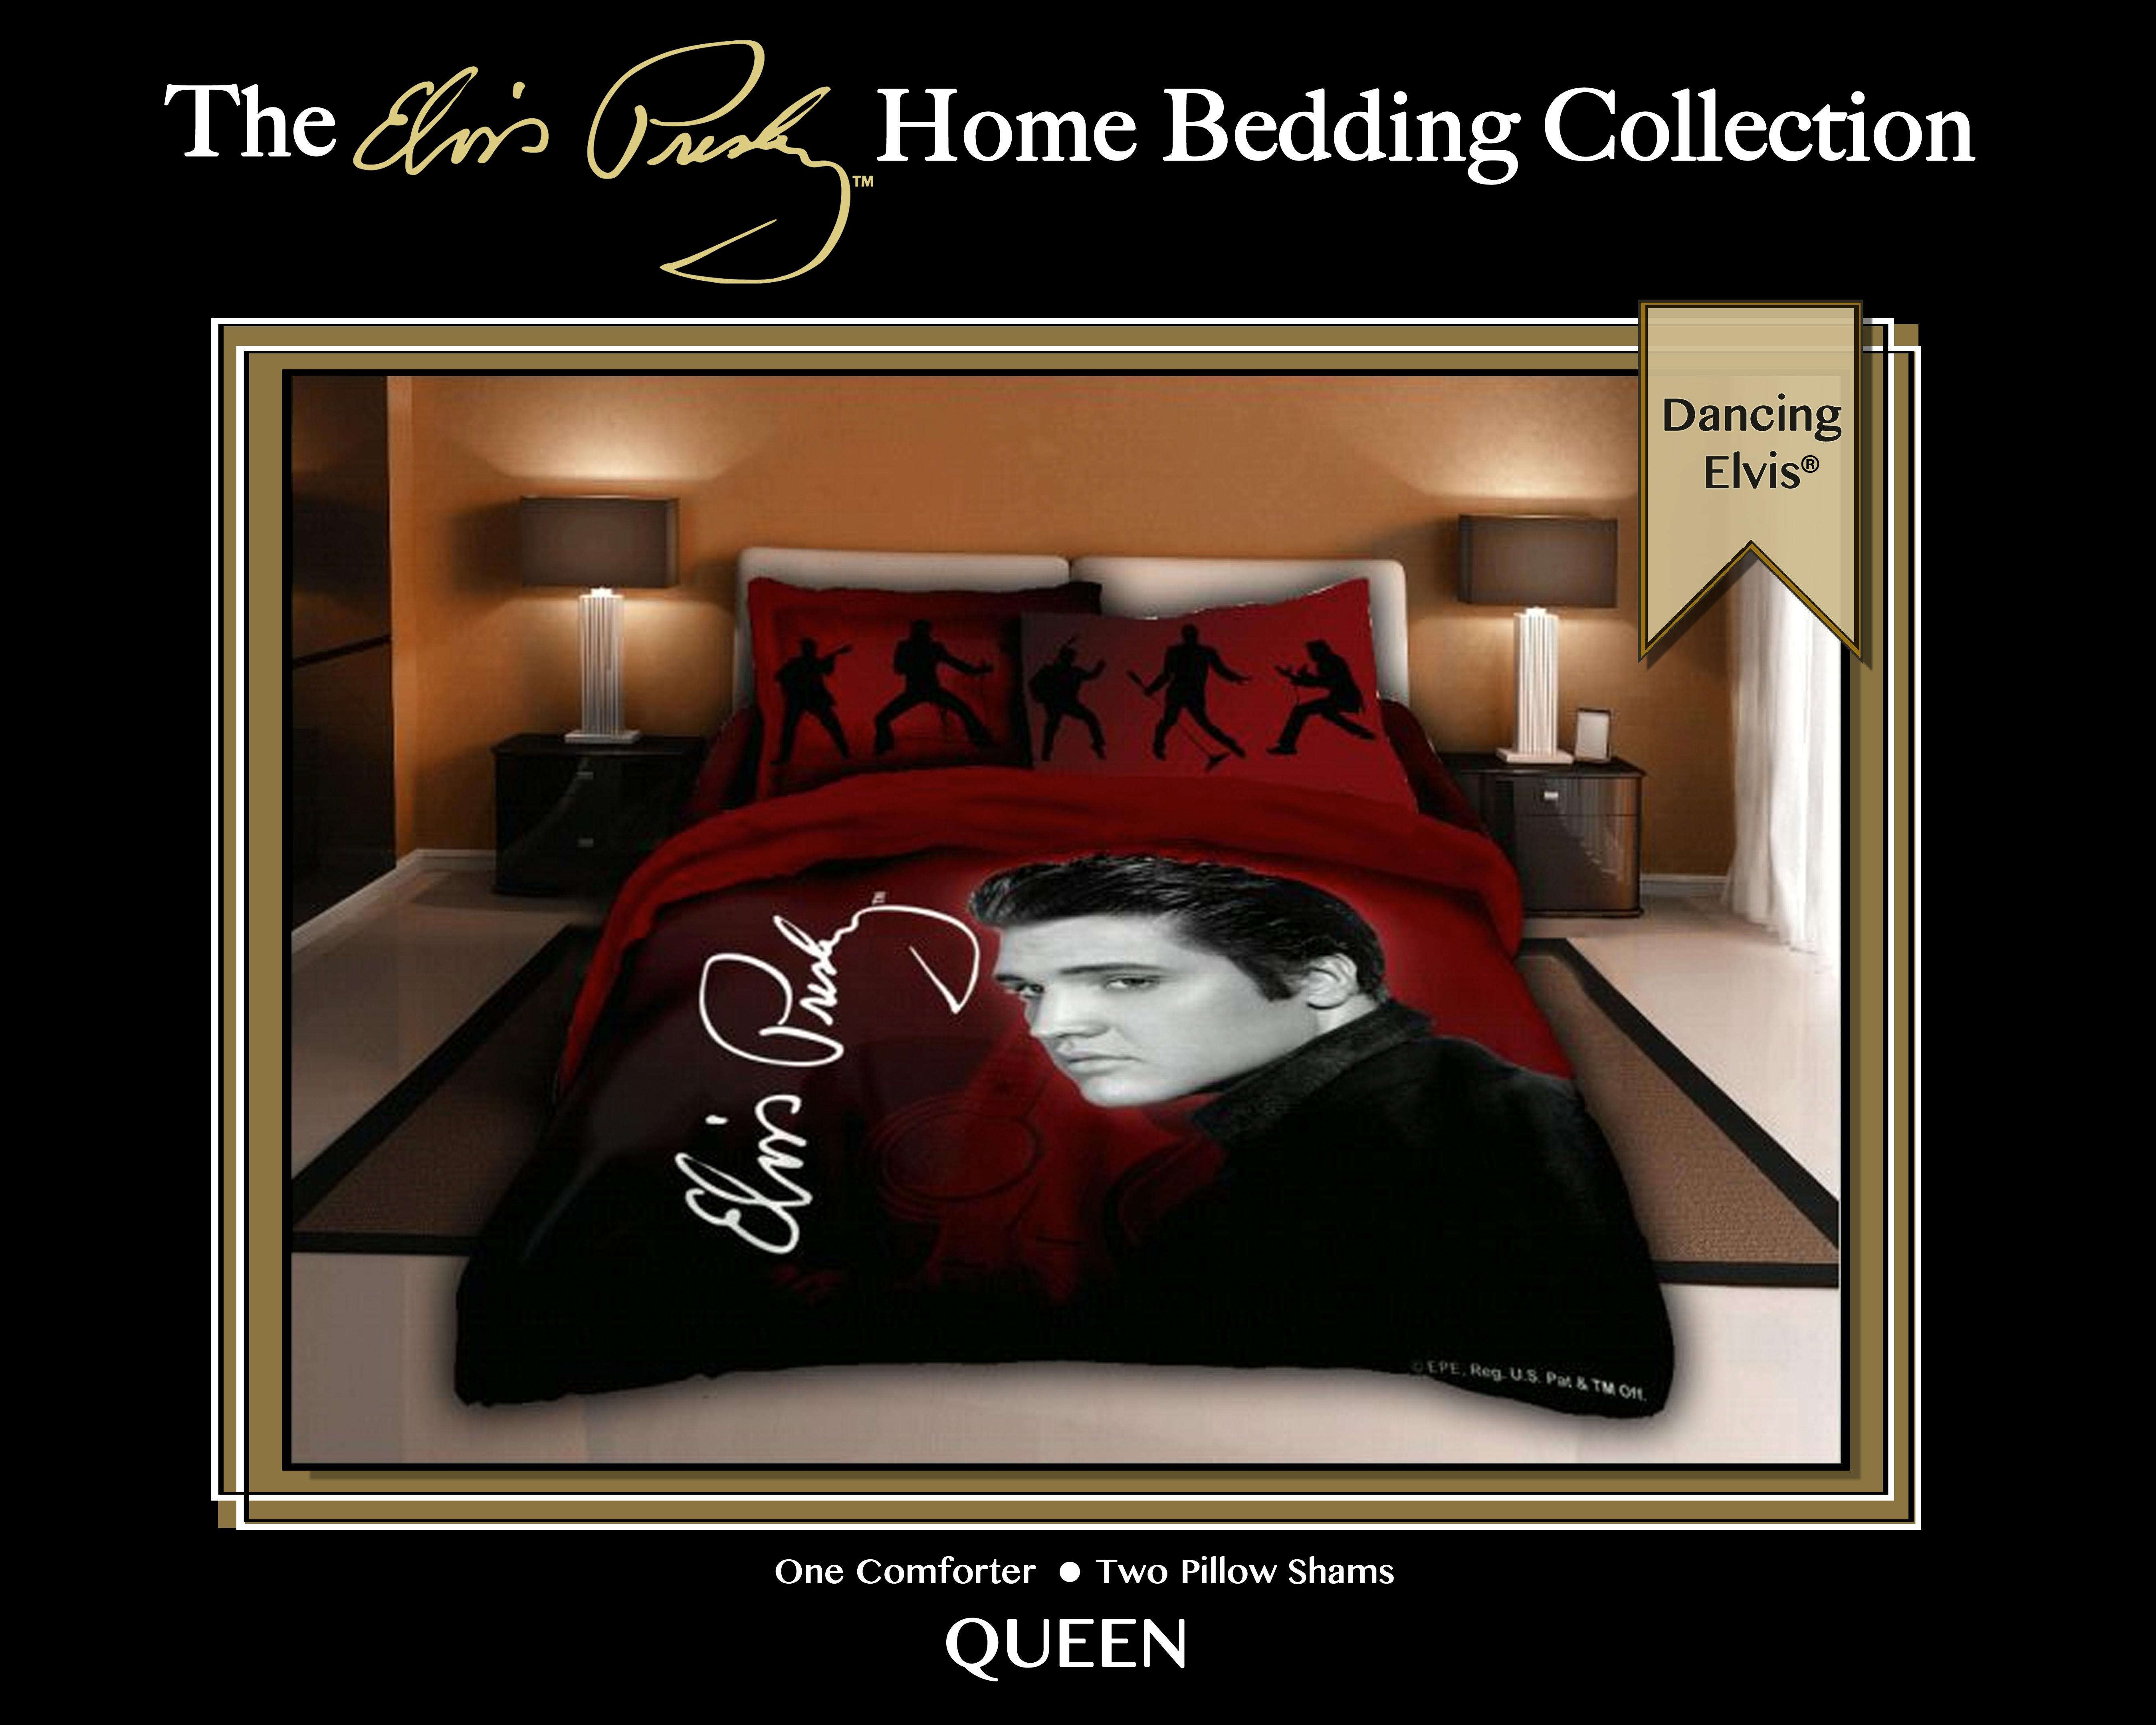 Legends Home Bedding Presents The Elvis Presley 174 Home